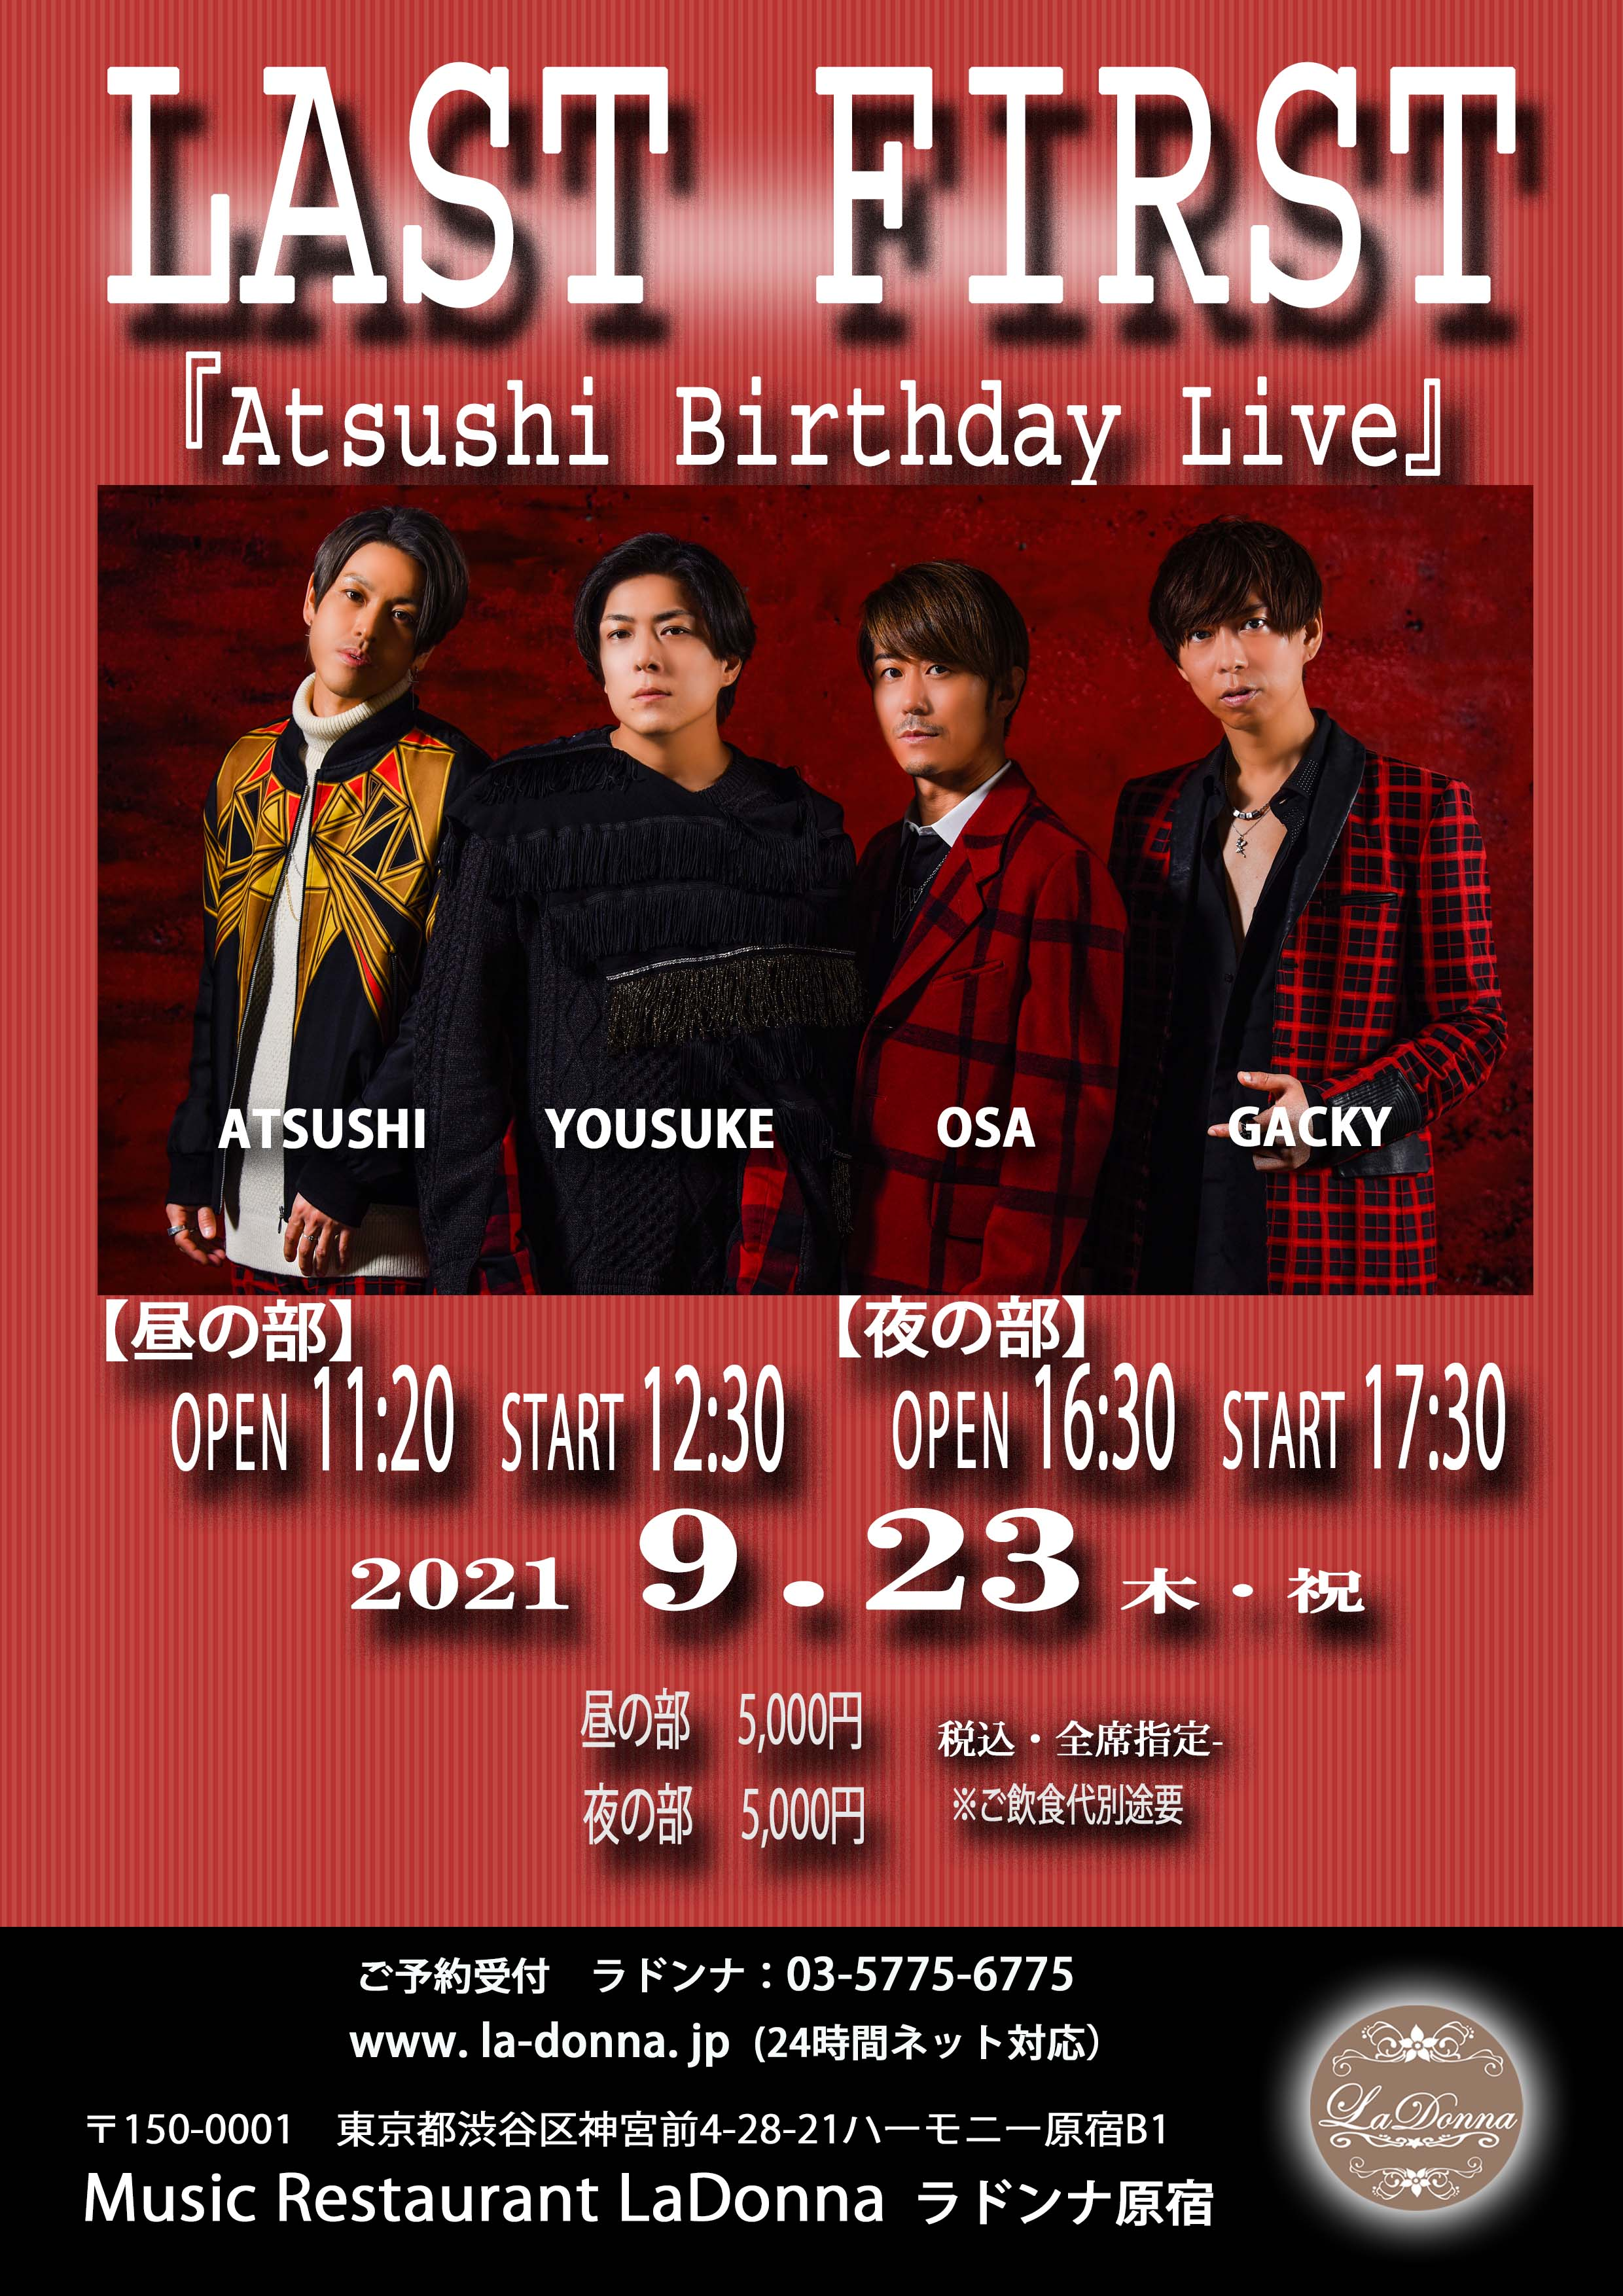 LAST FIRST 〜ATSUSHI Birthday Live〜